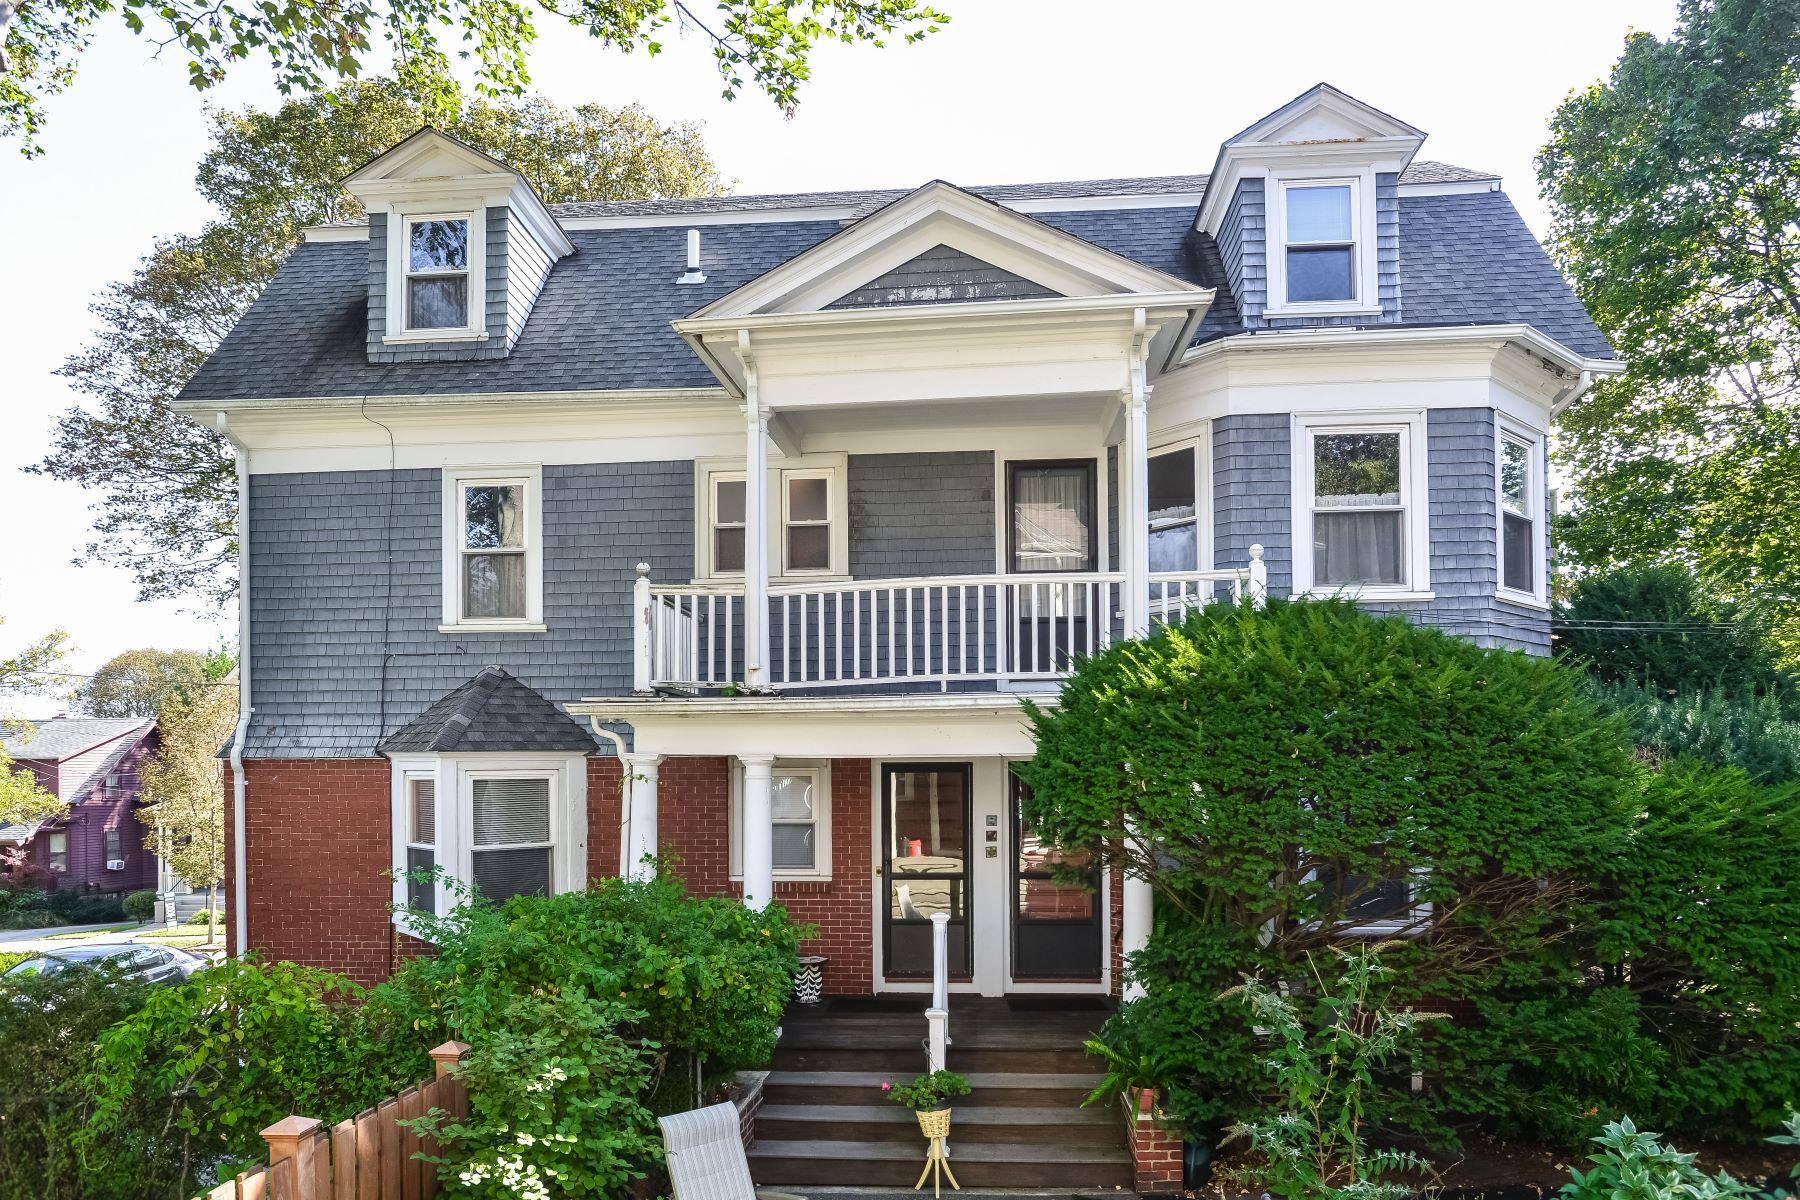 多户住宅 为 销售 在 62 - 64 Forest St, East Side Of Prov, RI 62 - 64 Forest St 普罗维登斯, 罗得岛 02906 美国